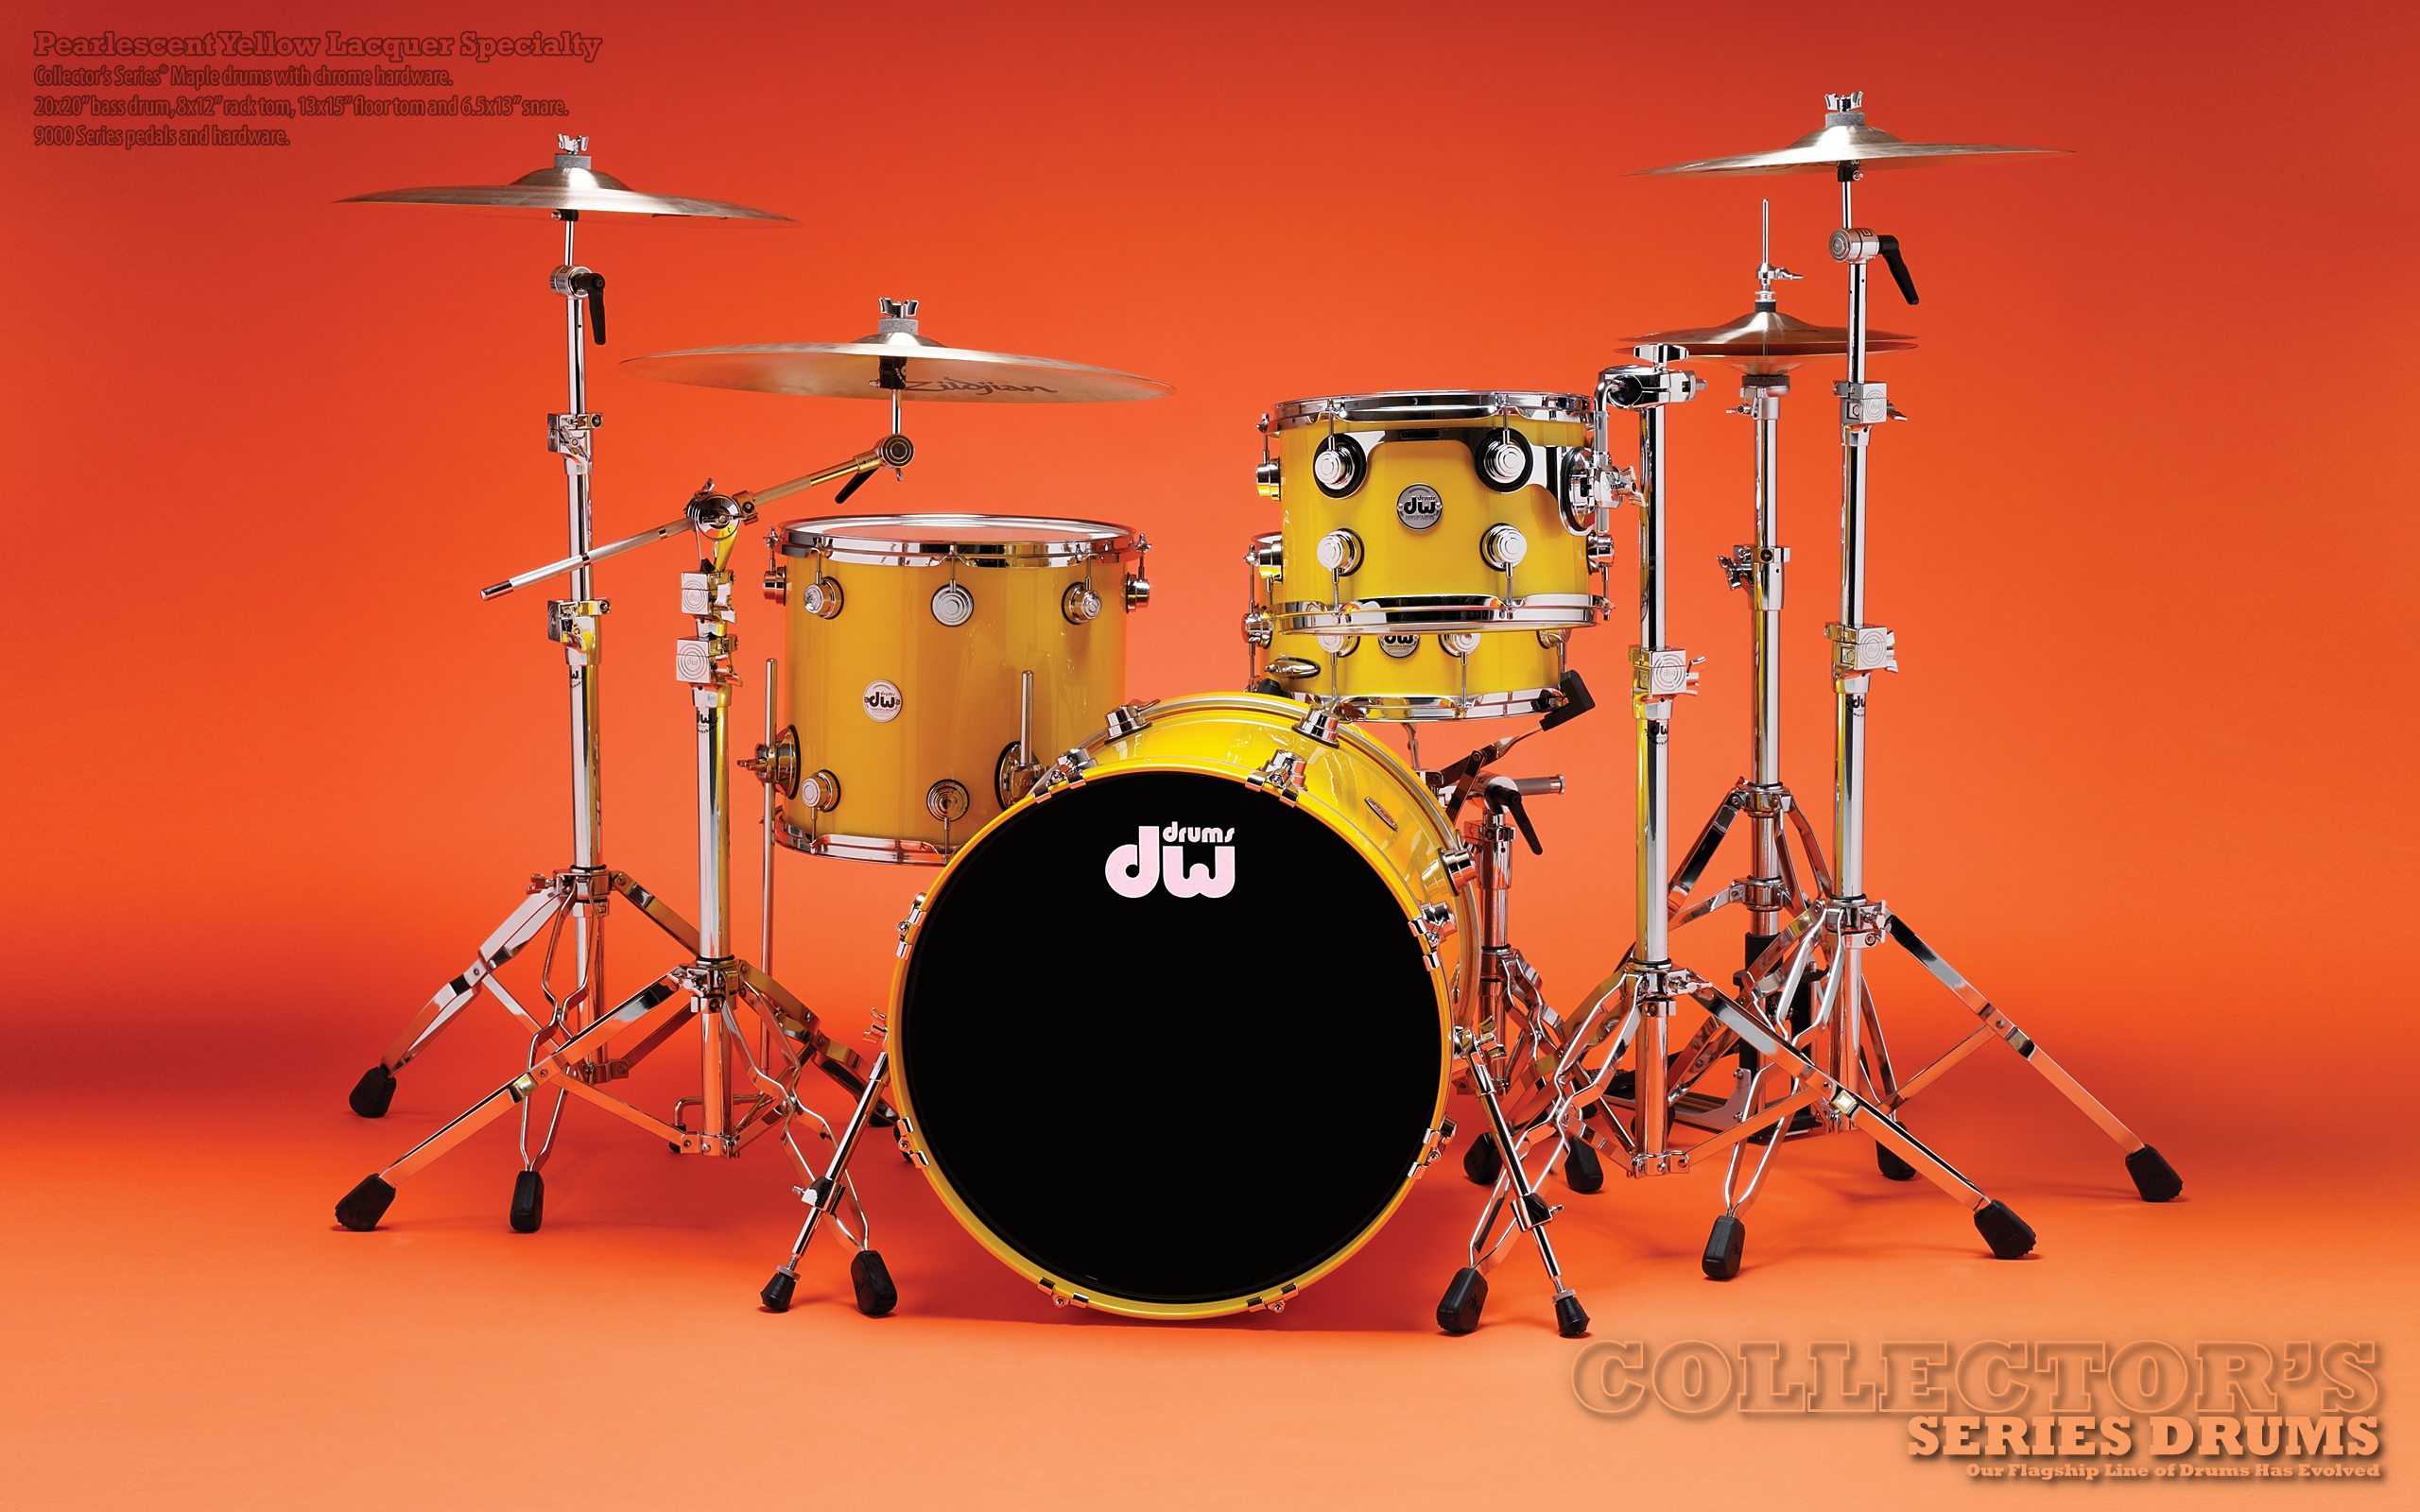 49 Dw Drums Wallpapers Hd On Wallpapersafari